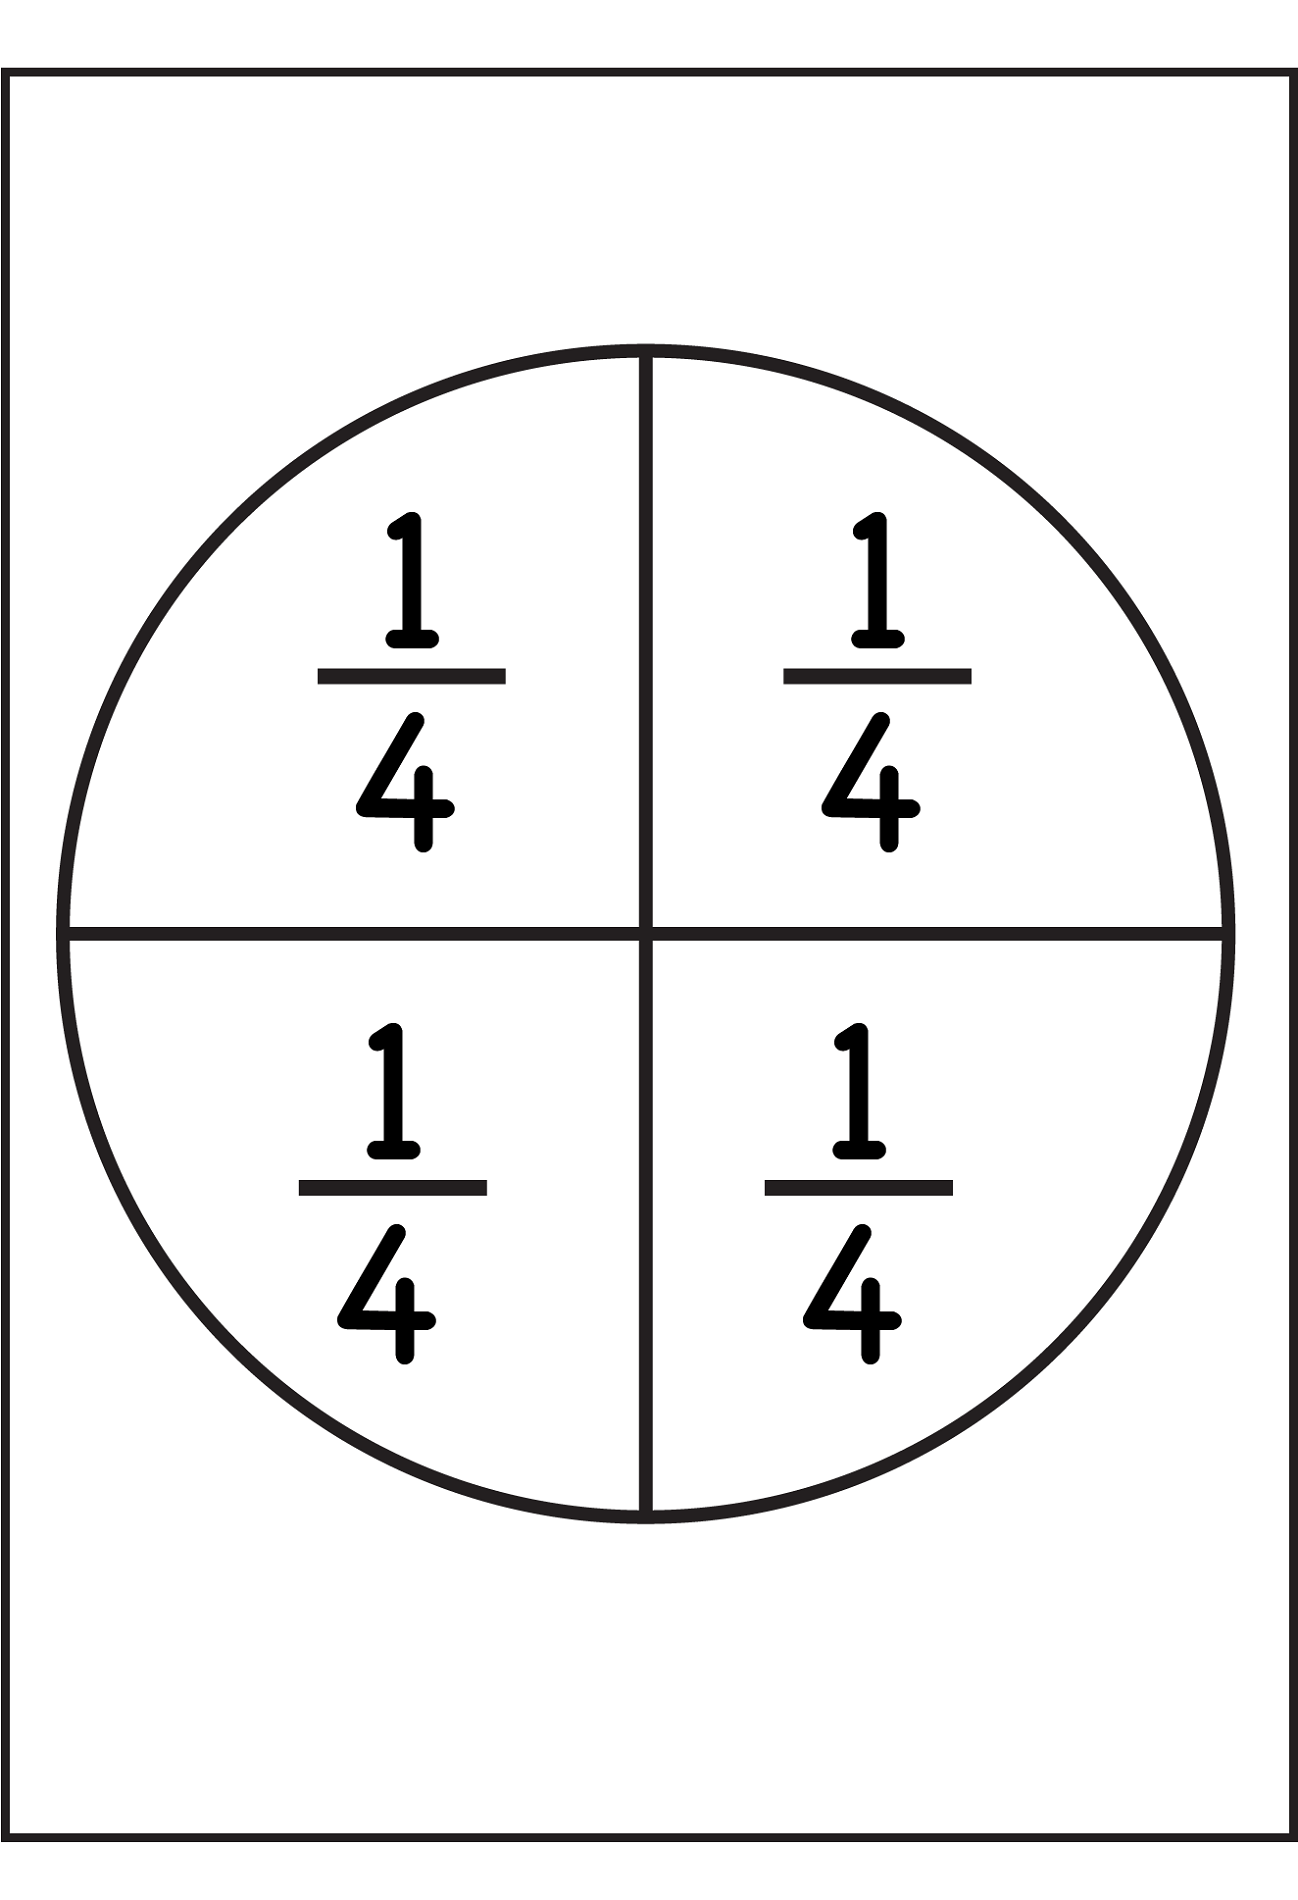 Percent Circle Templates Printable